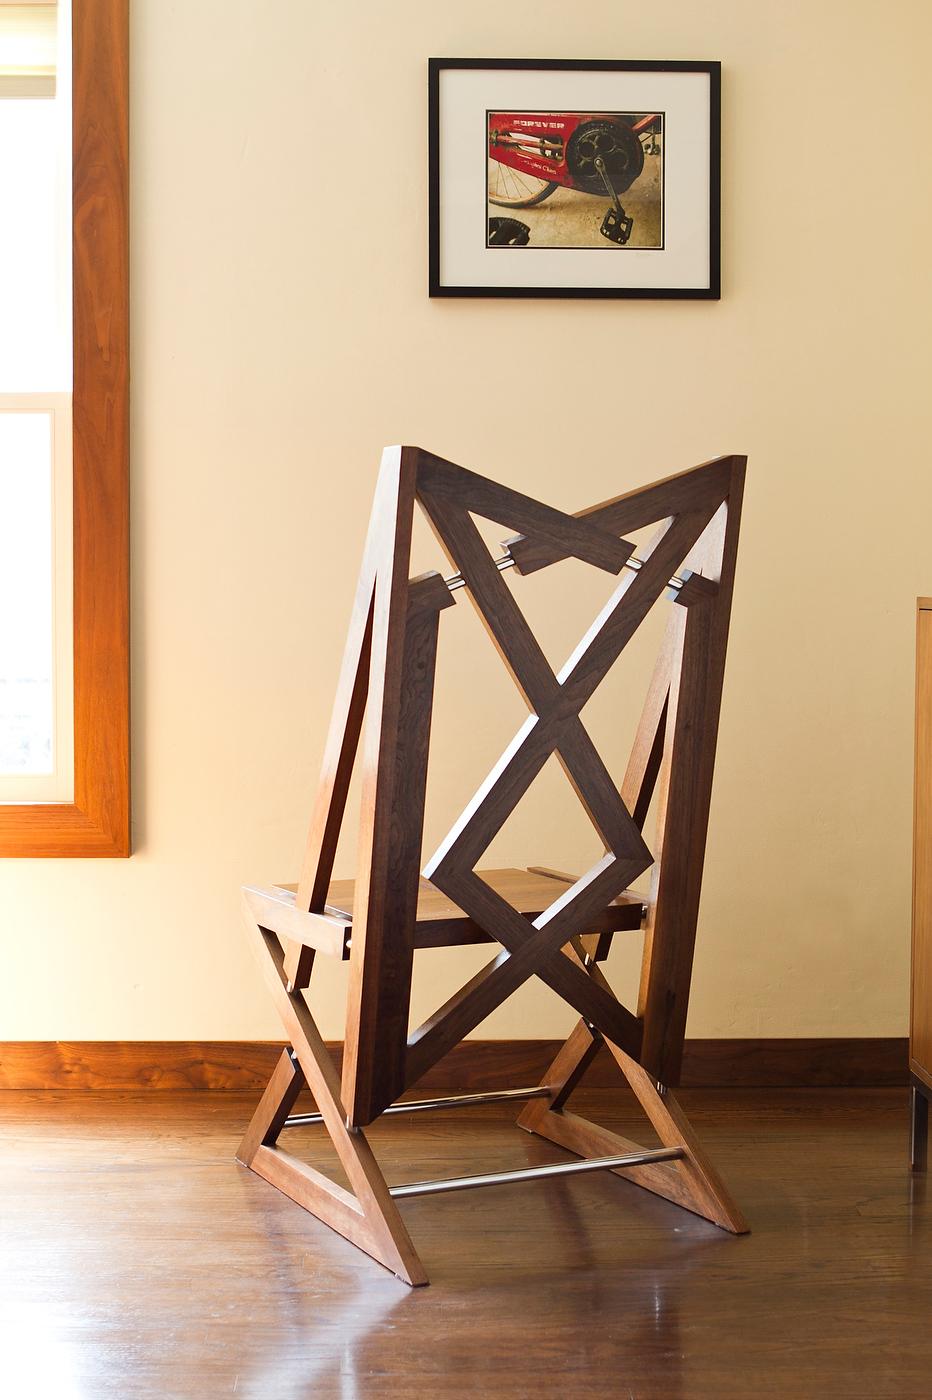 furniture-chair-thing-04.jpg